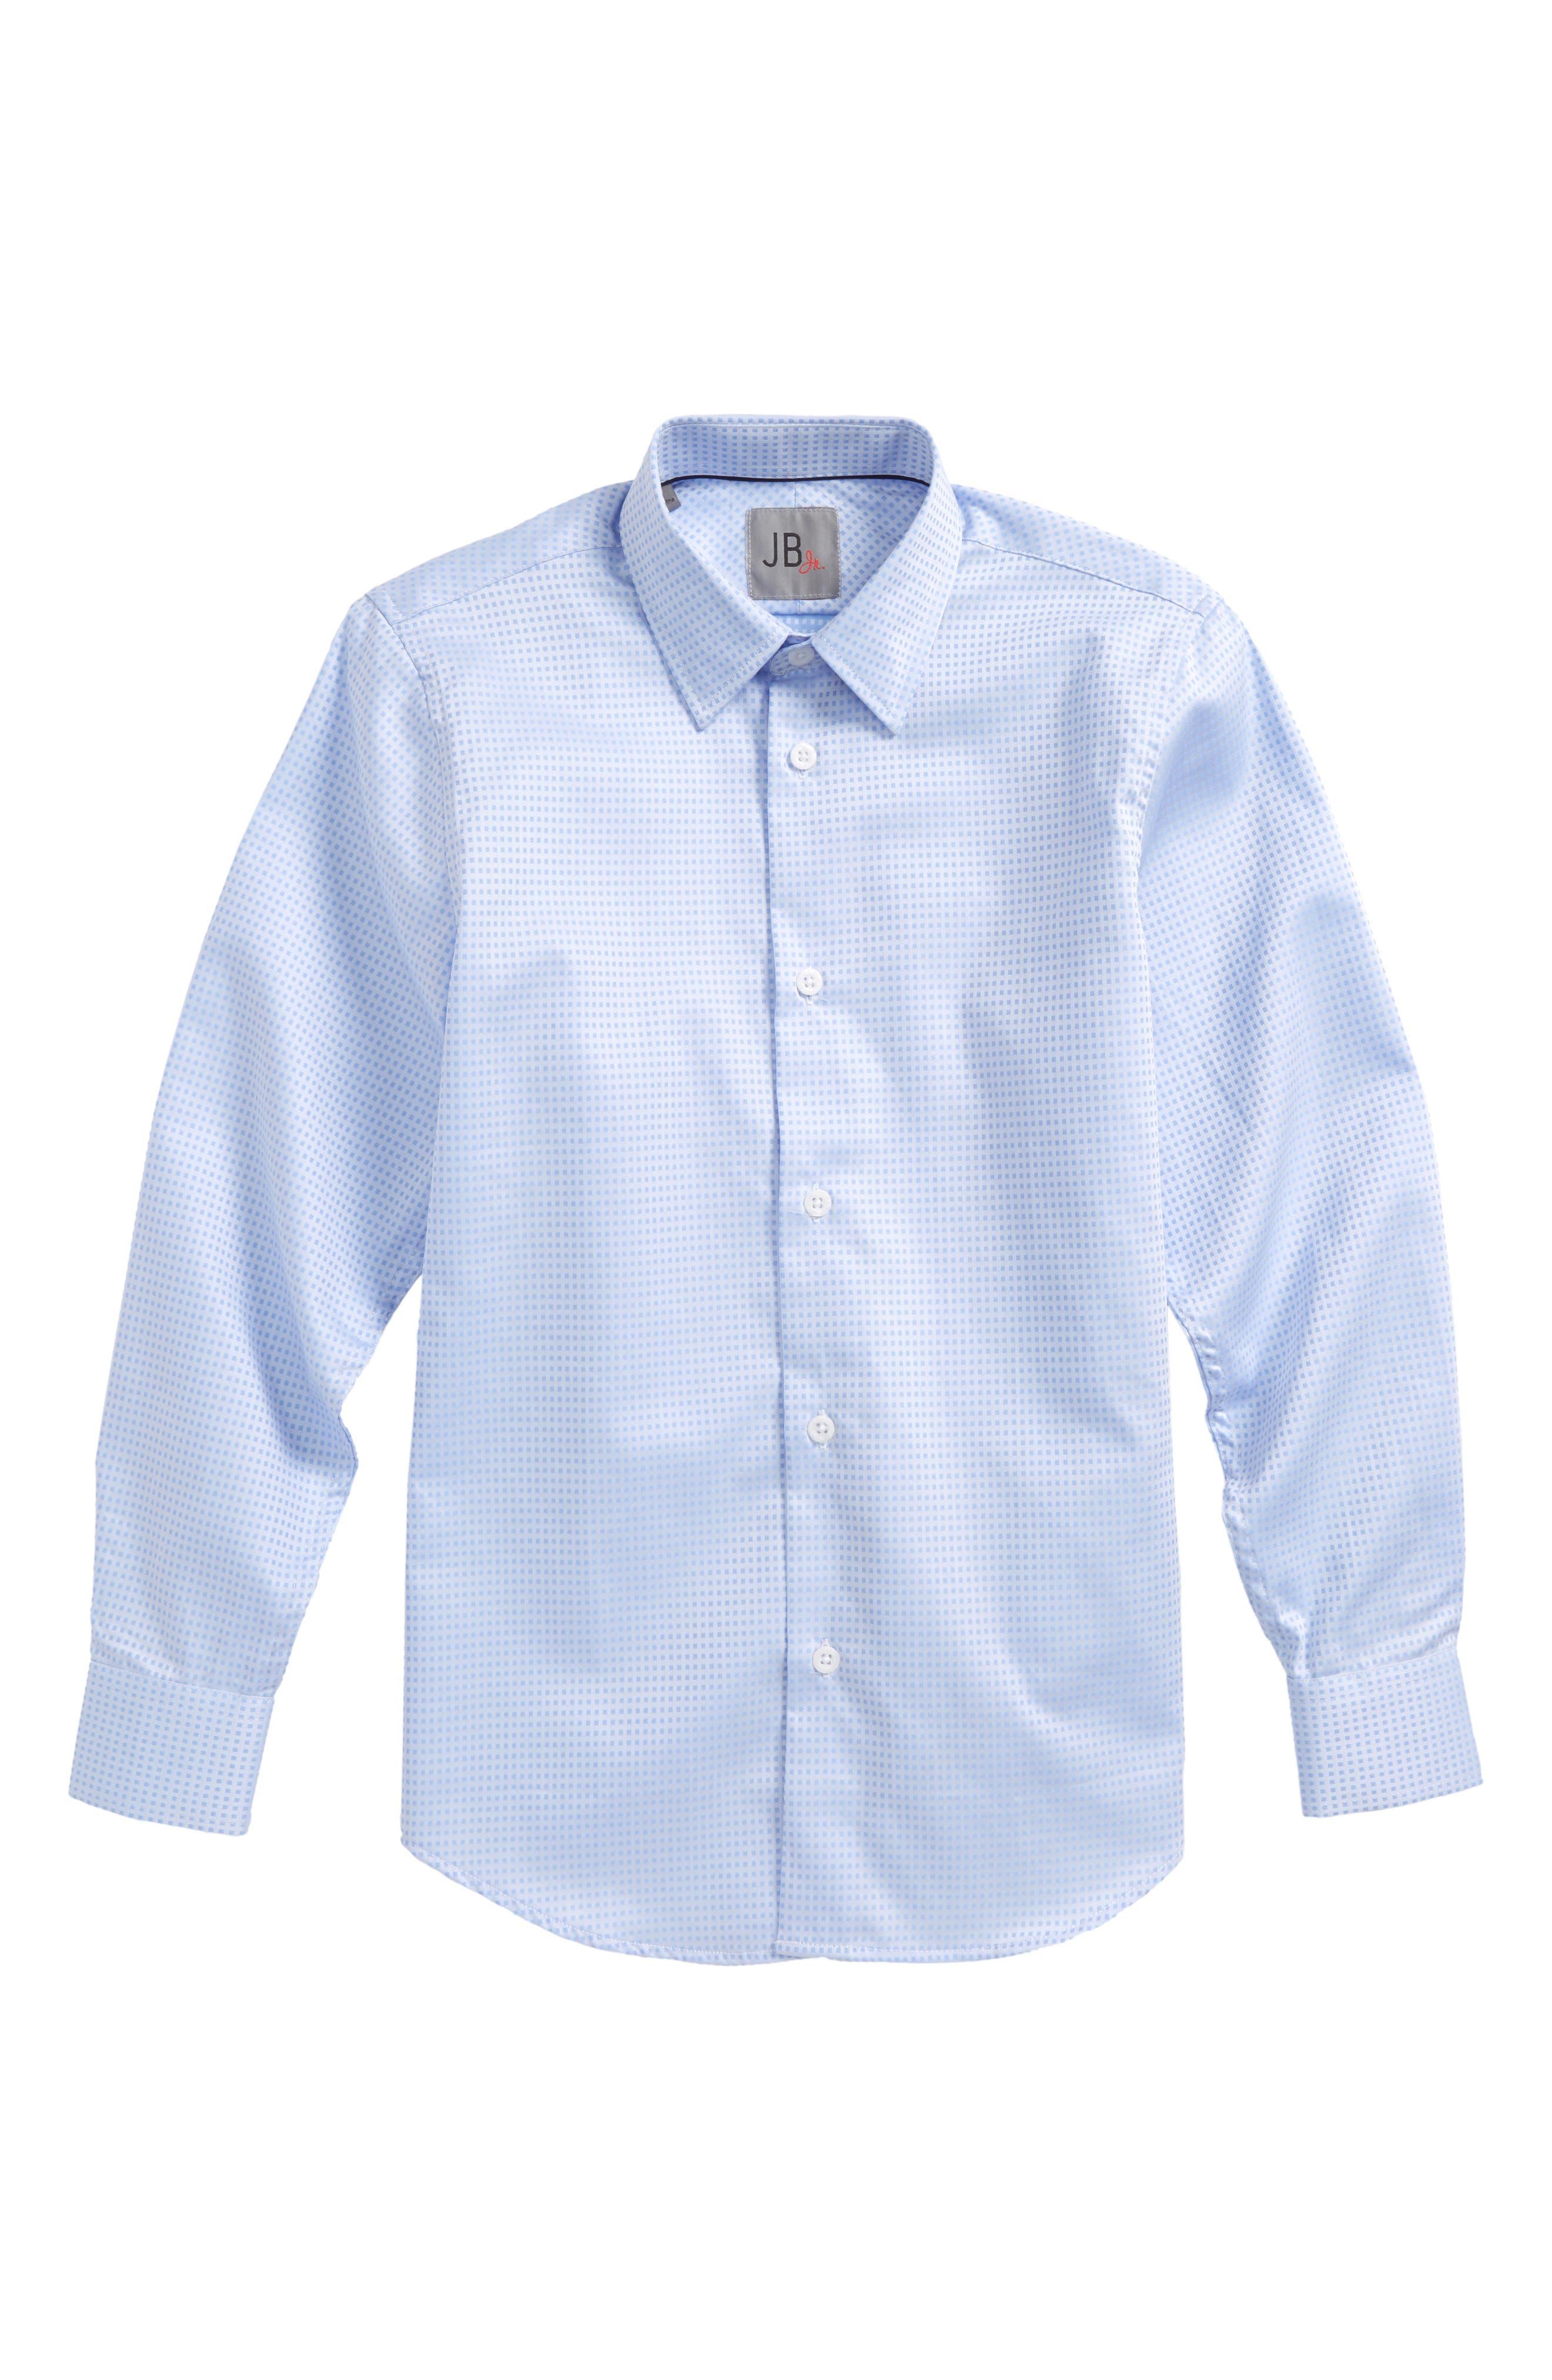 Microcheck Dress Shirt,                         Main,                         color, Lt Blue Check